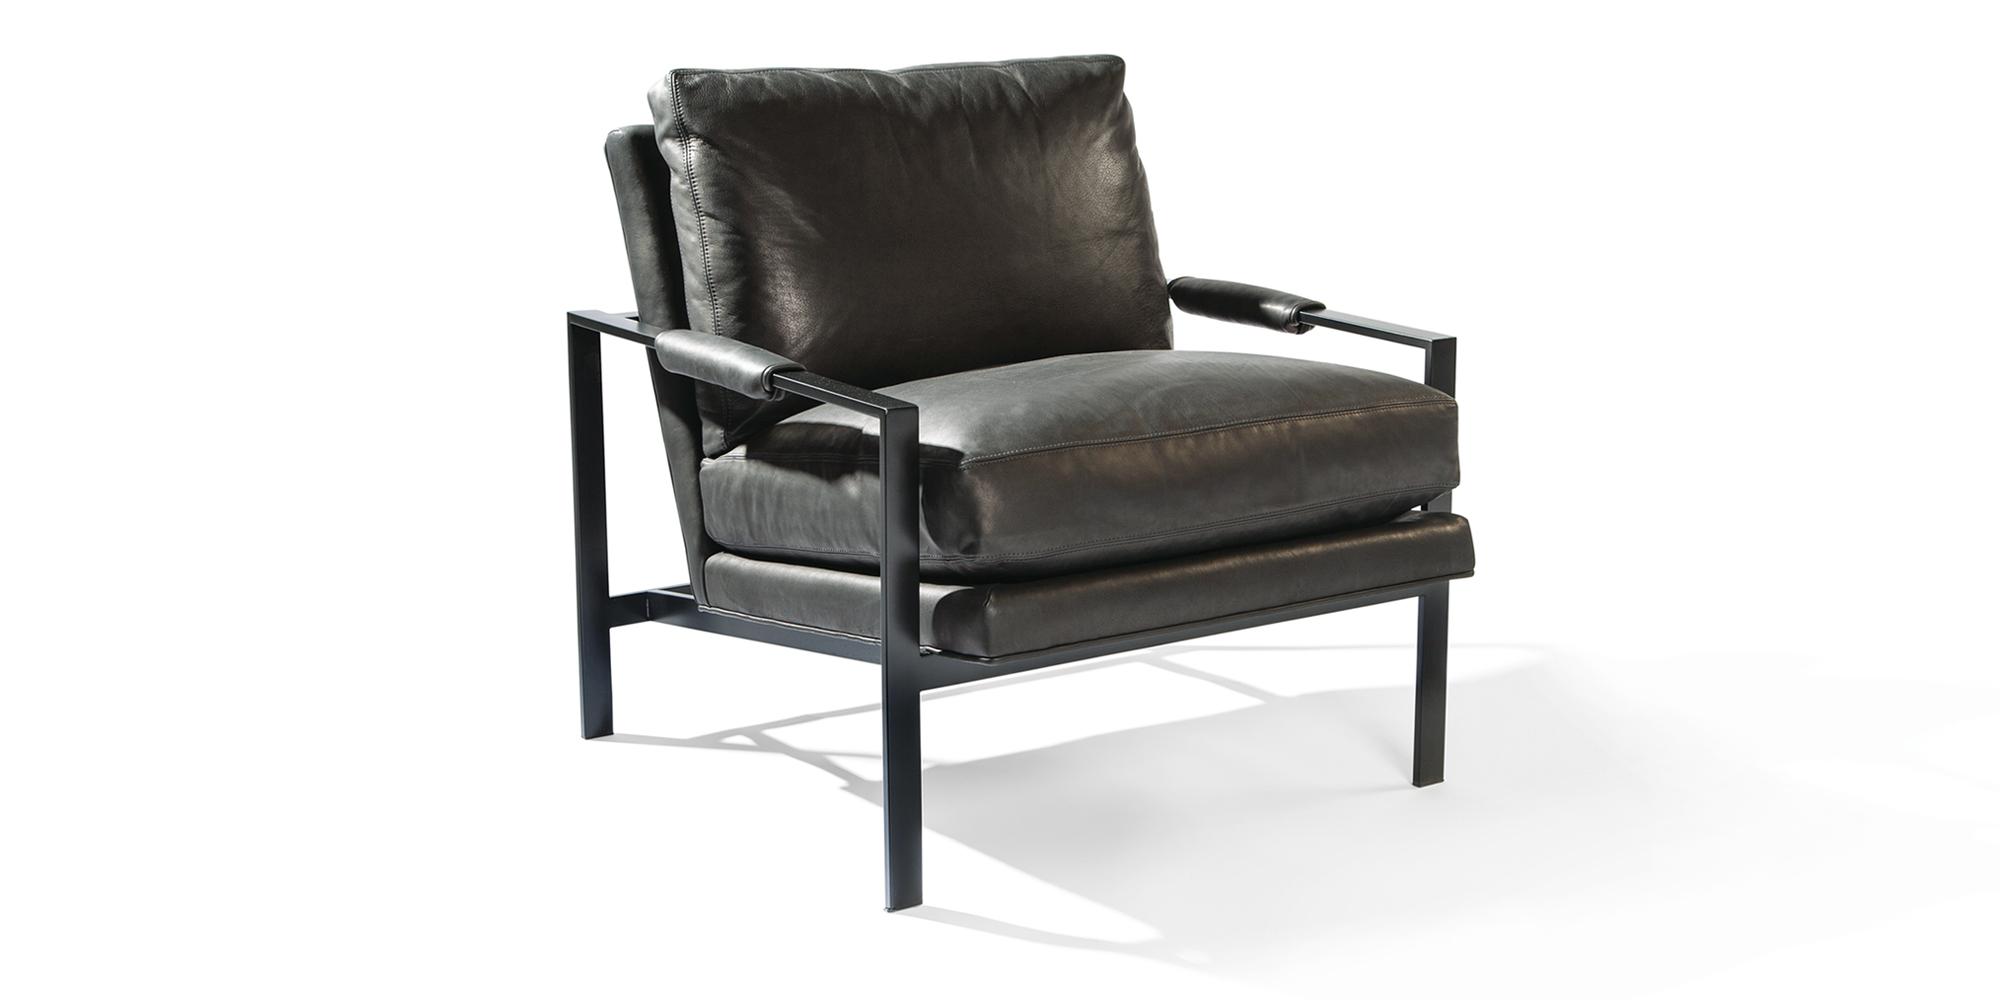 951 Design Classic Chair (Noir finish)